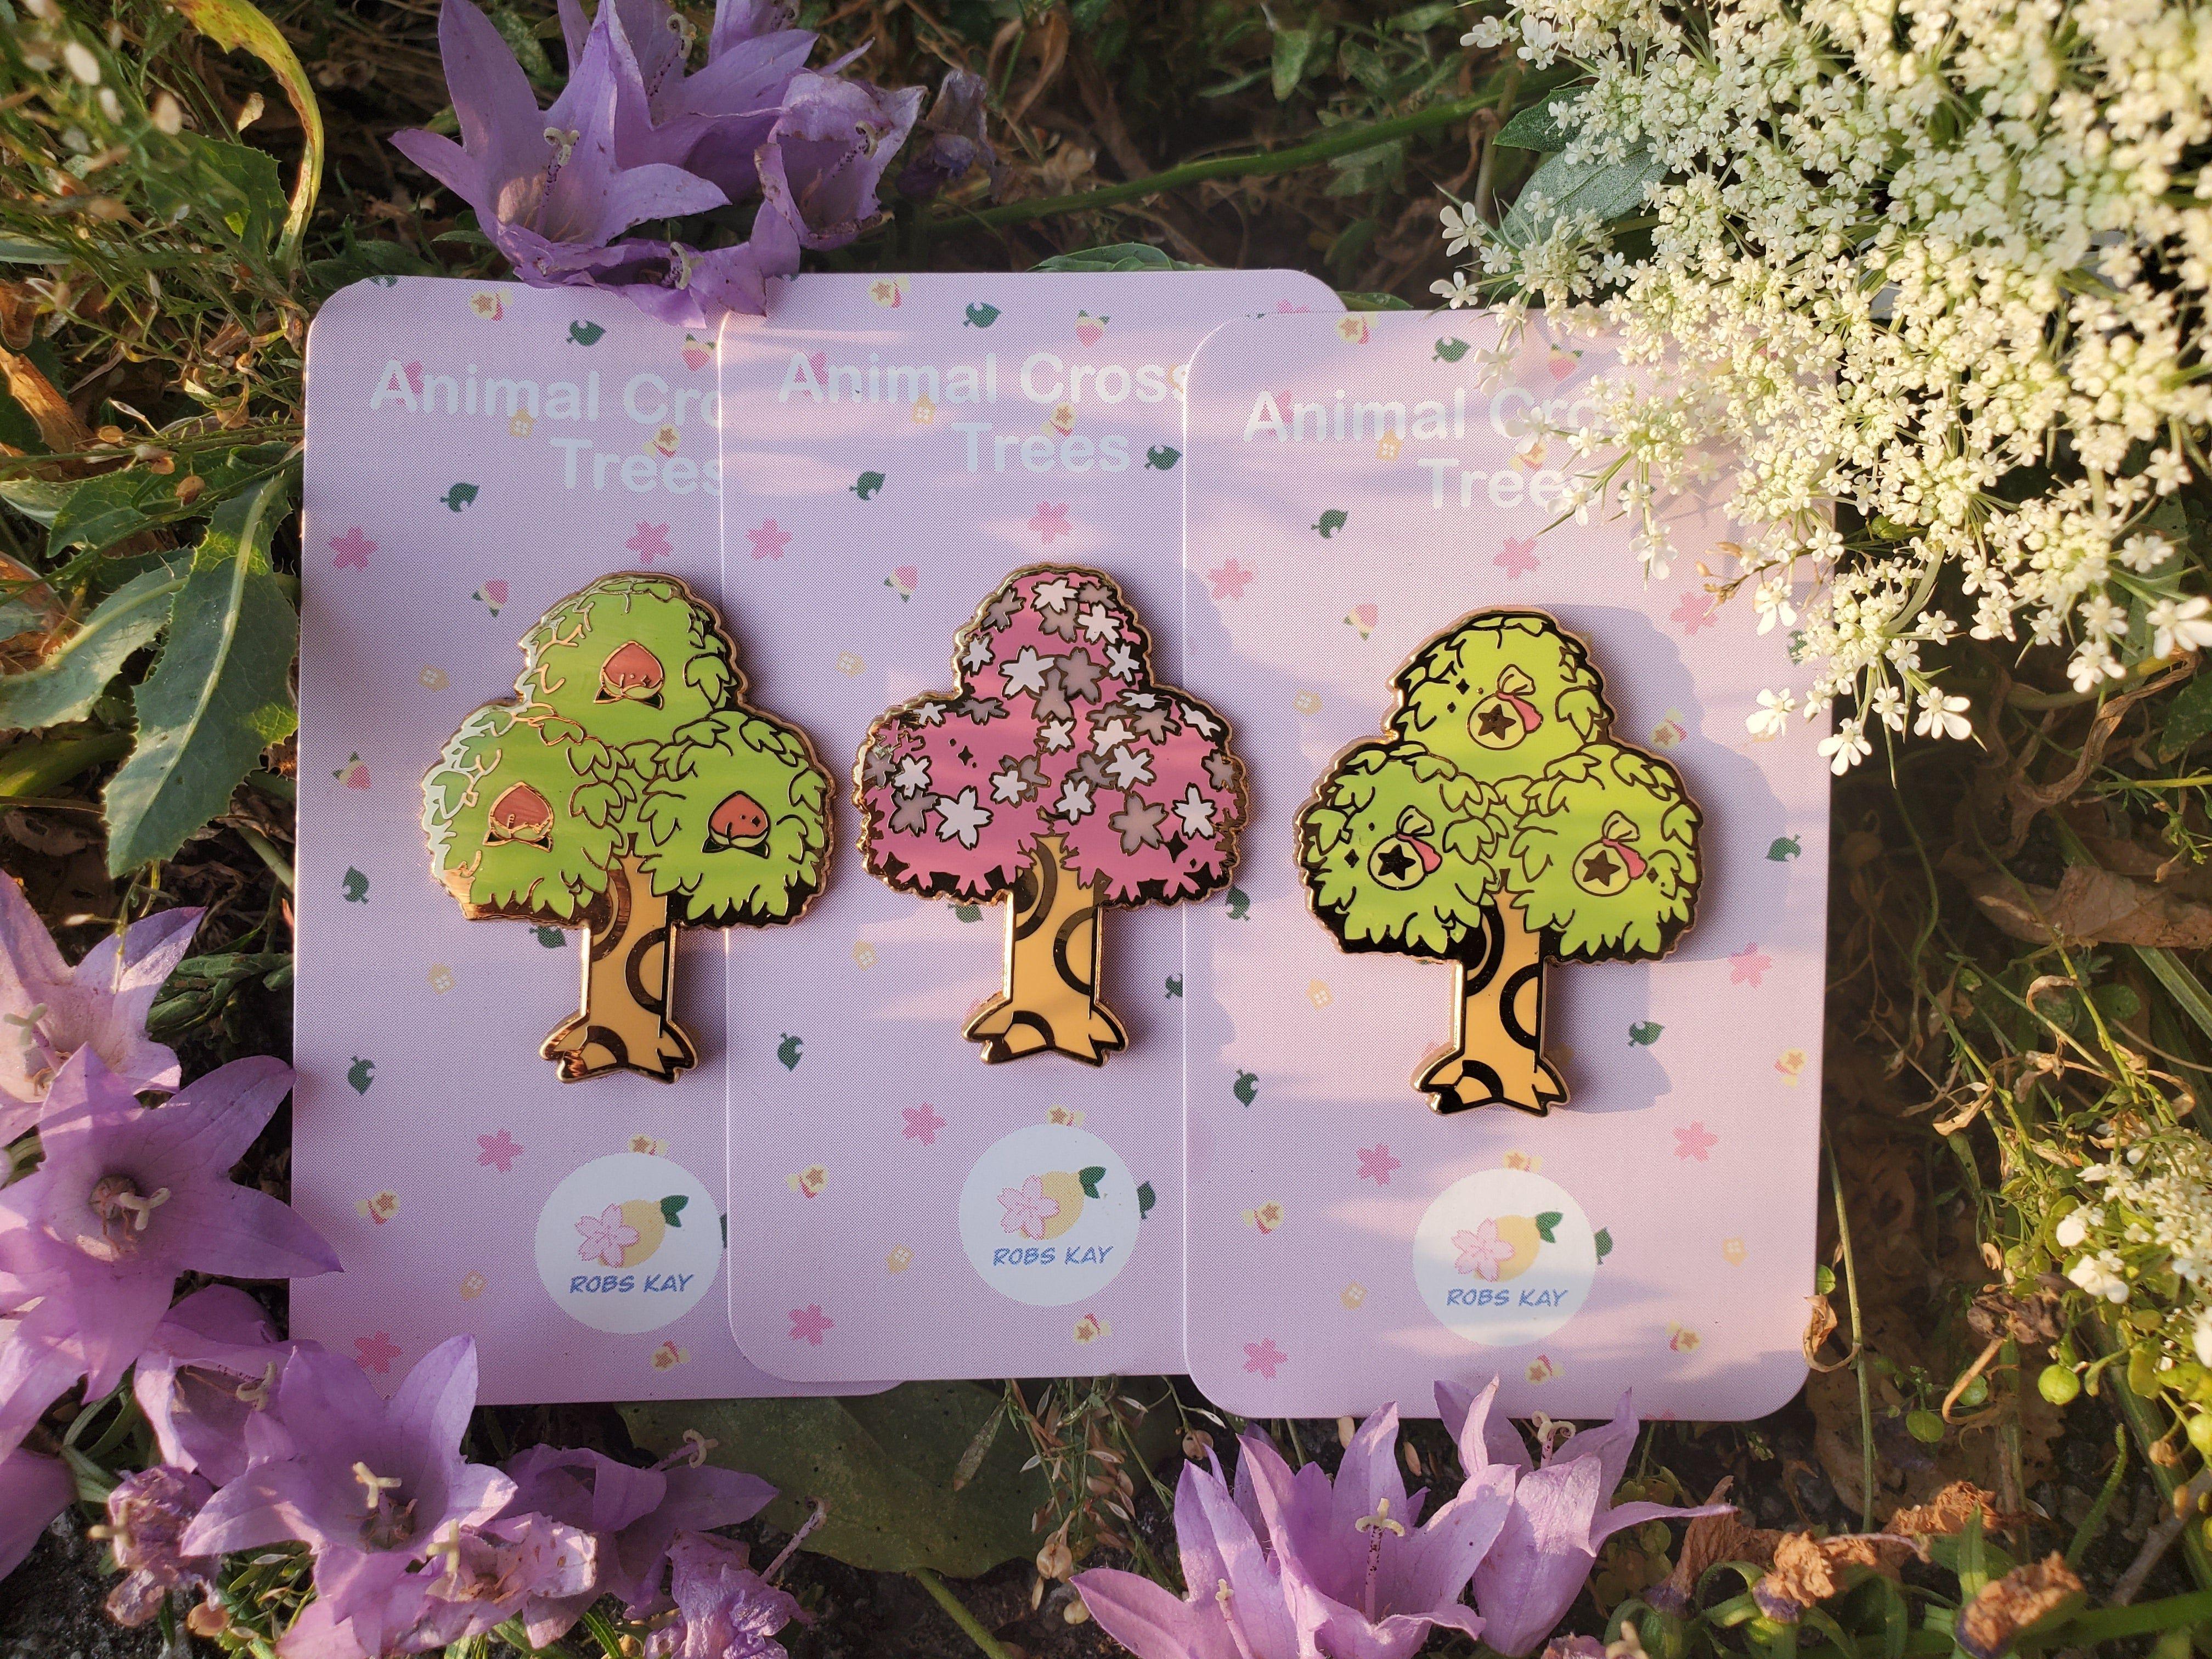 Animal Crossing Trees Pins Animal Crossing Cute Pins Animal Crossing Game